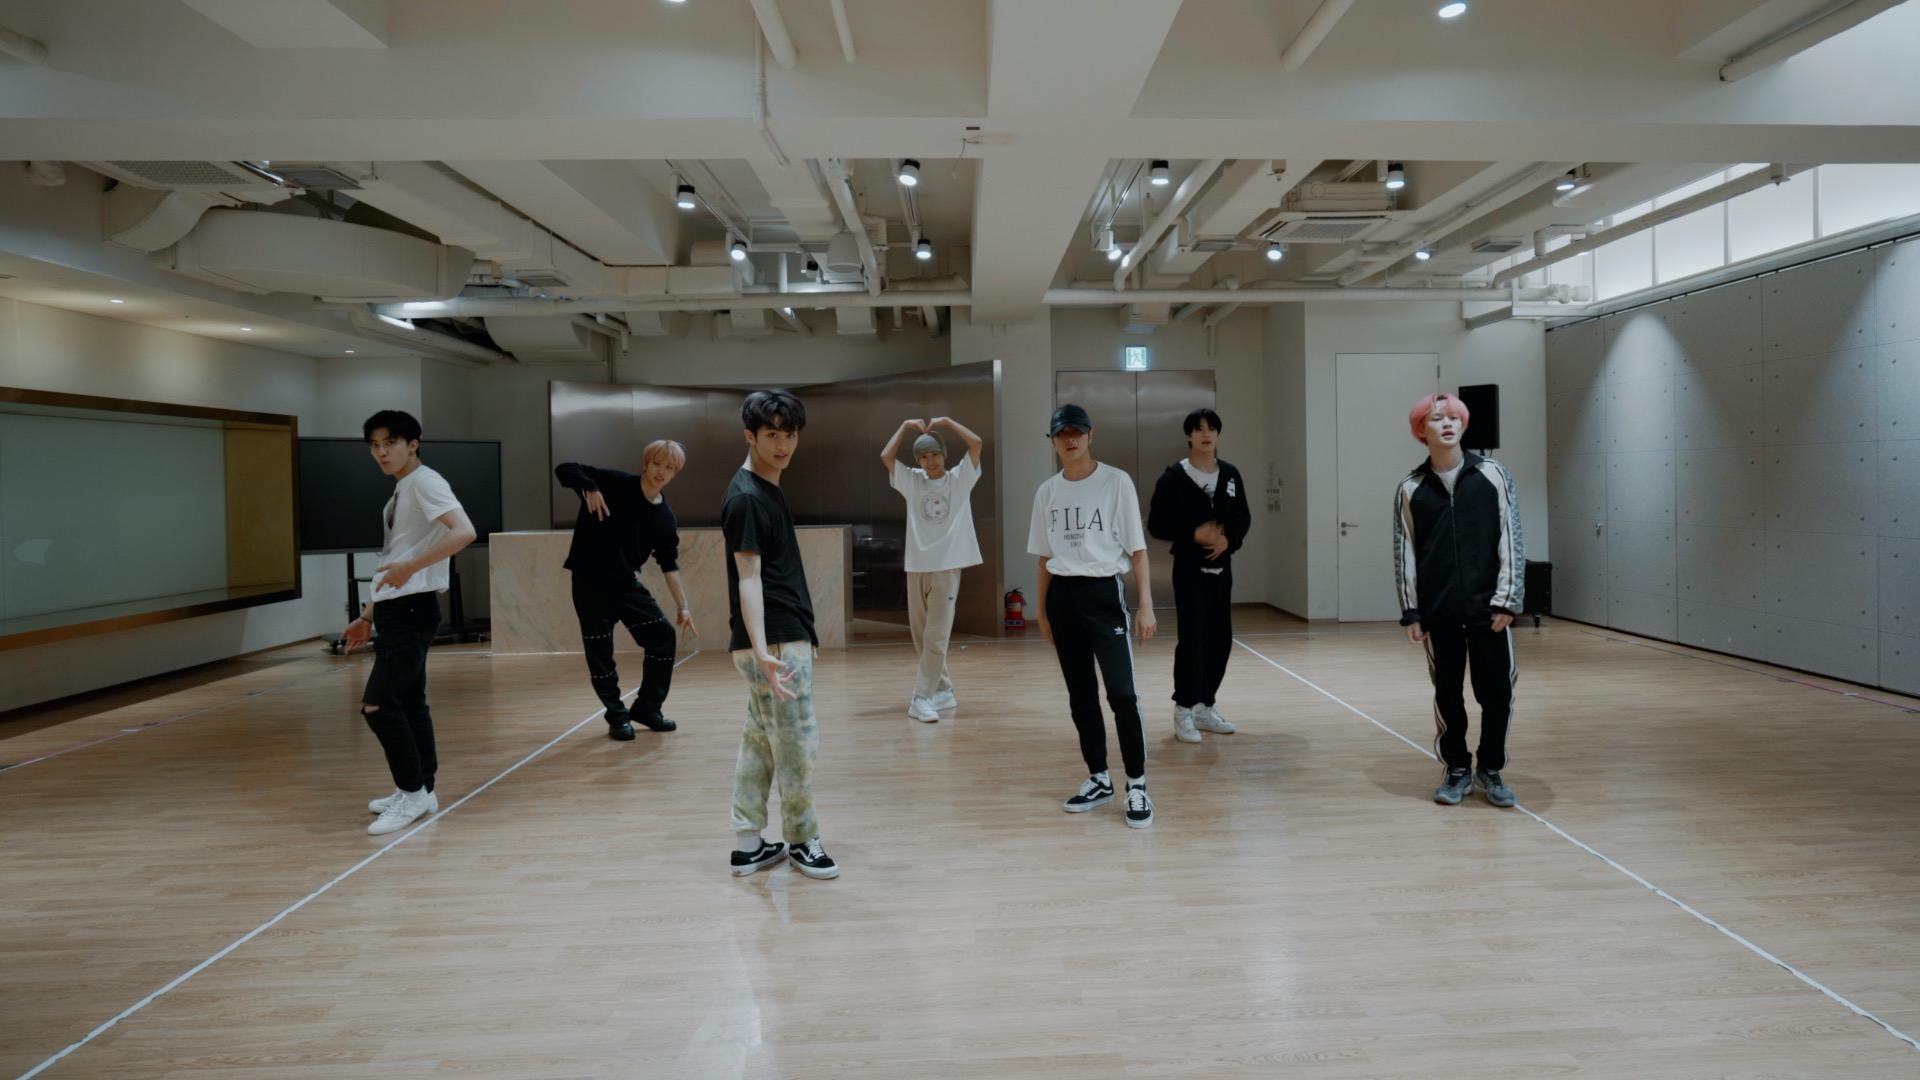 NCT DREAM 엔시티 드림 'Diggity' Dance Practice